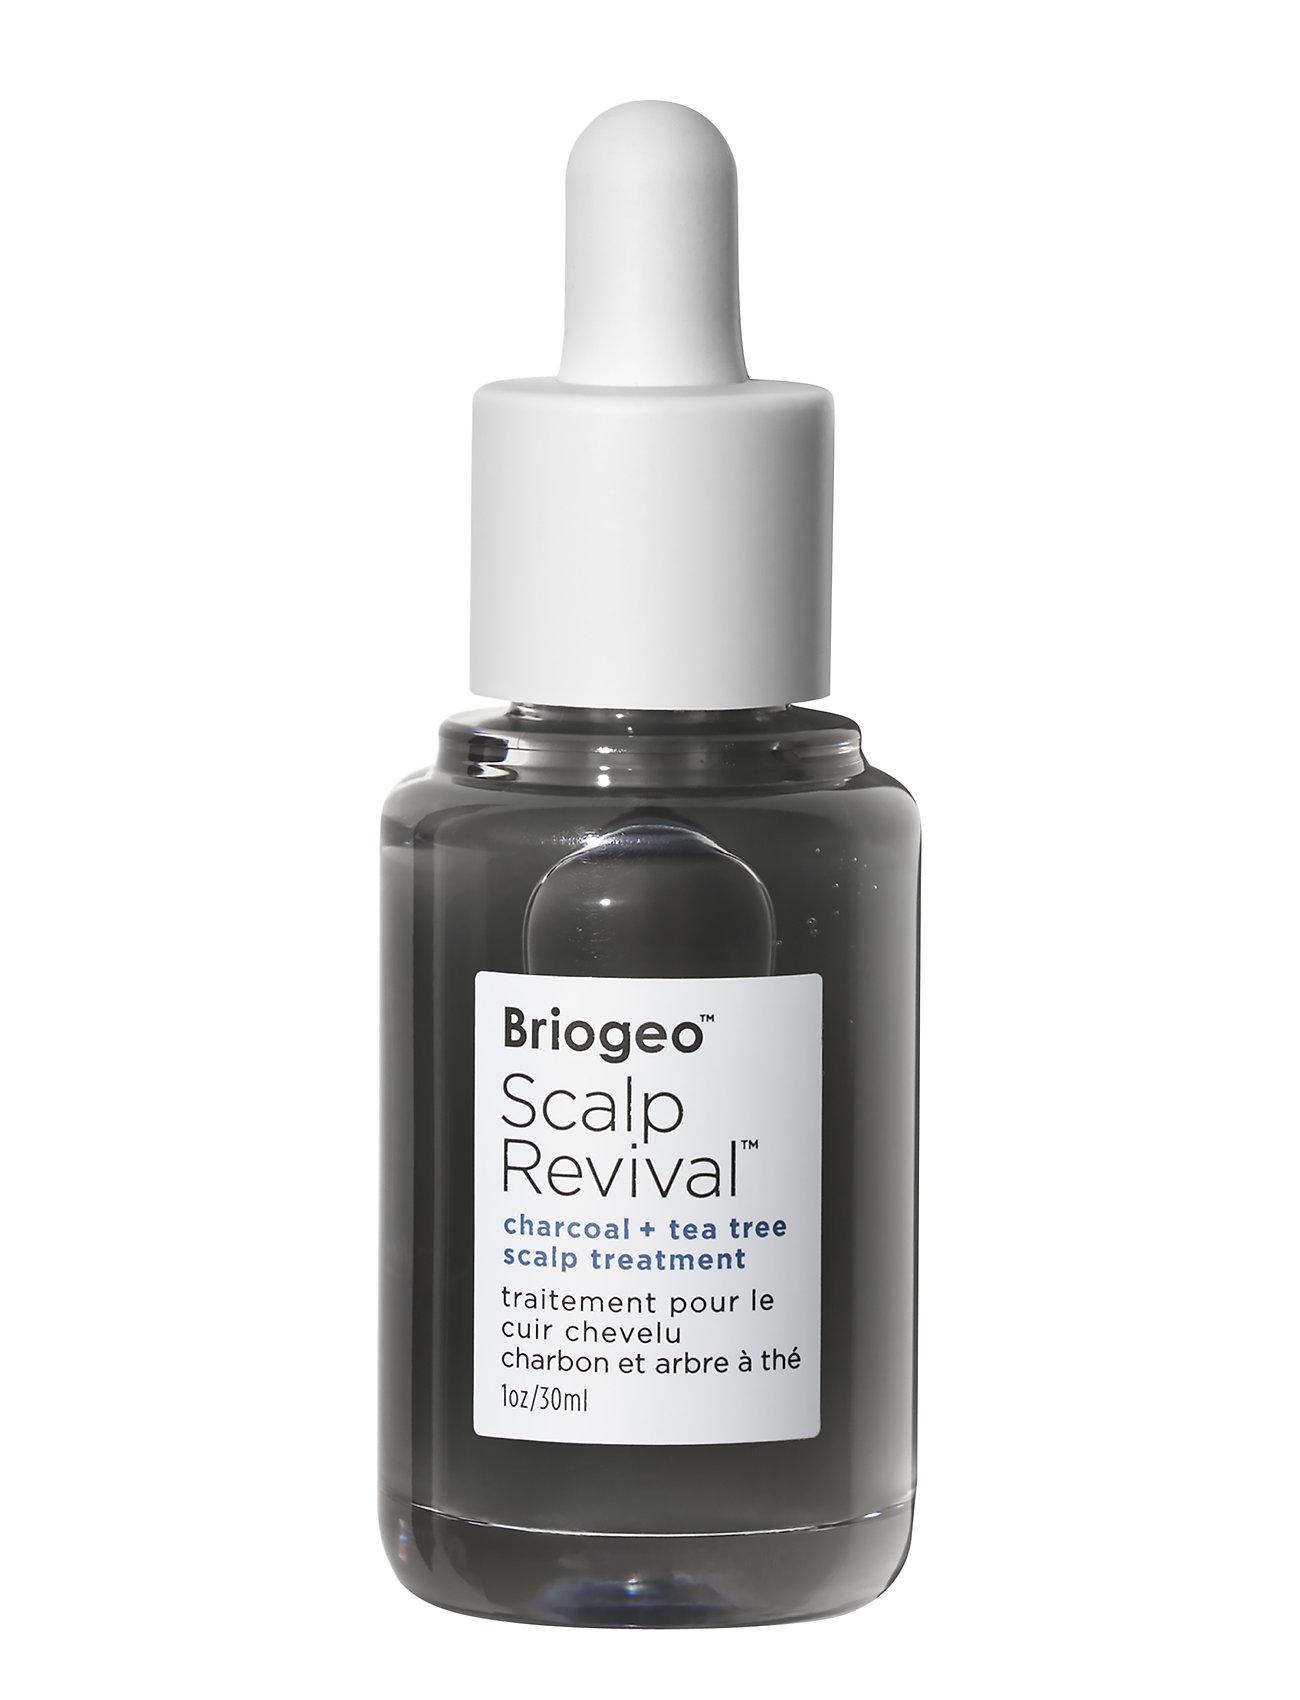 Briogeo Charcoal + Tea Tree Scalp Treatment - CLEAR